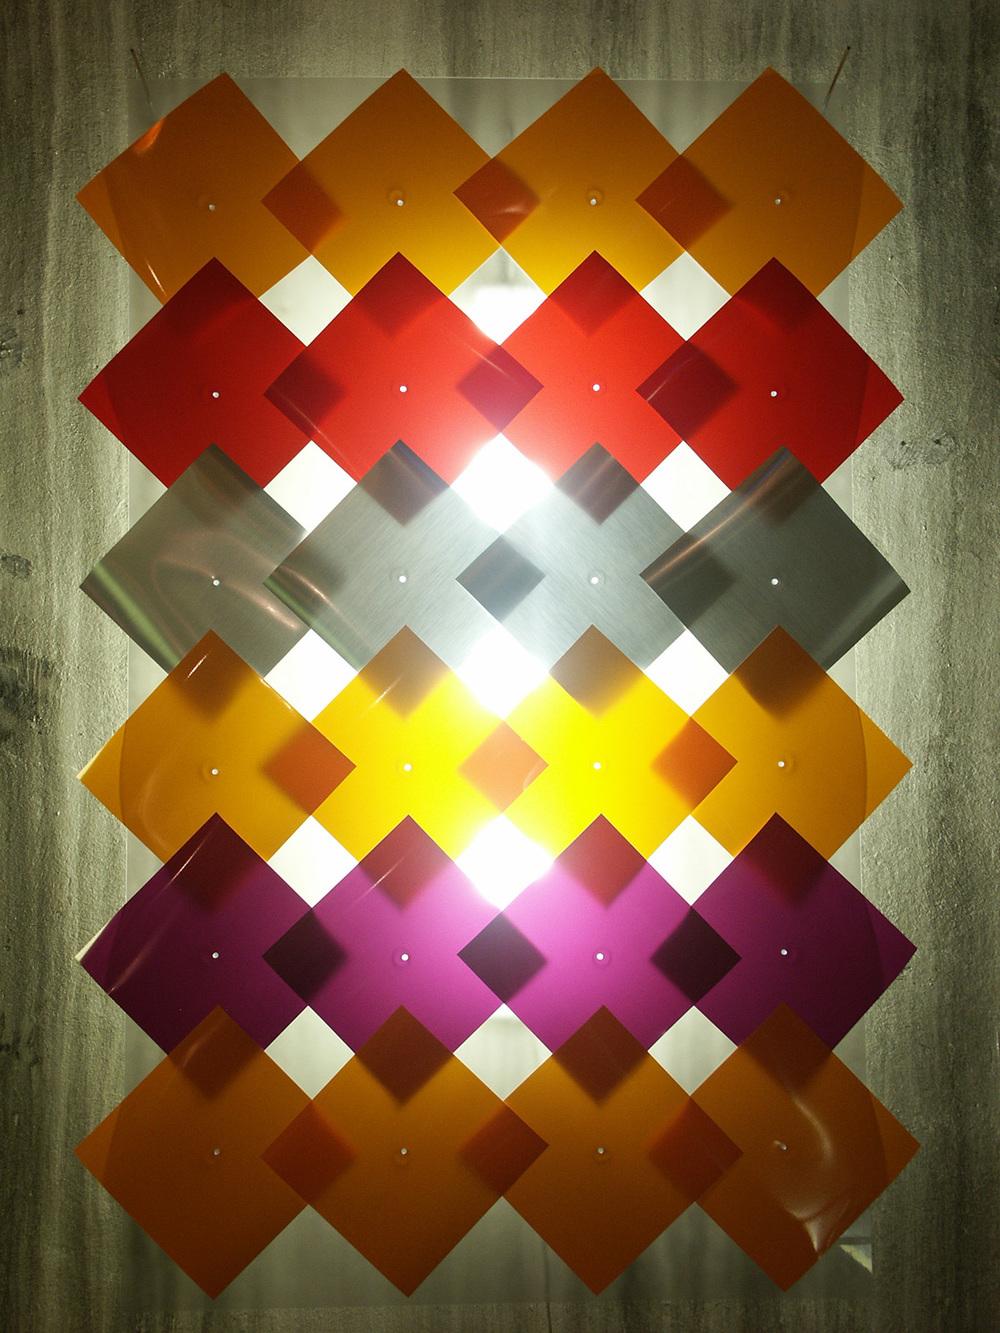 Freydenberg_Trans_Square_5.jpg